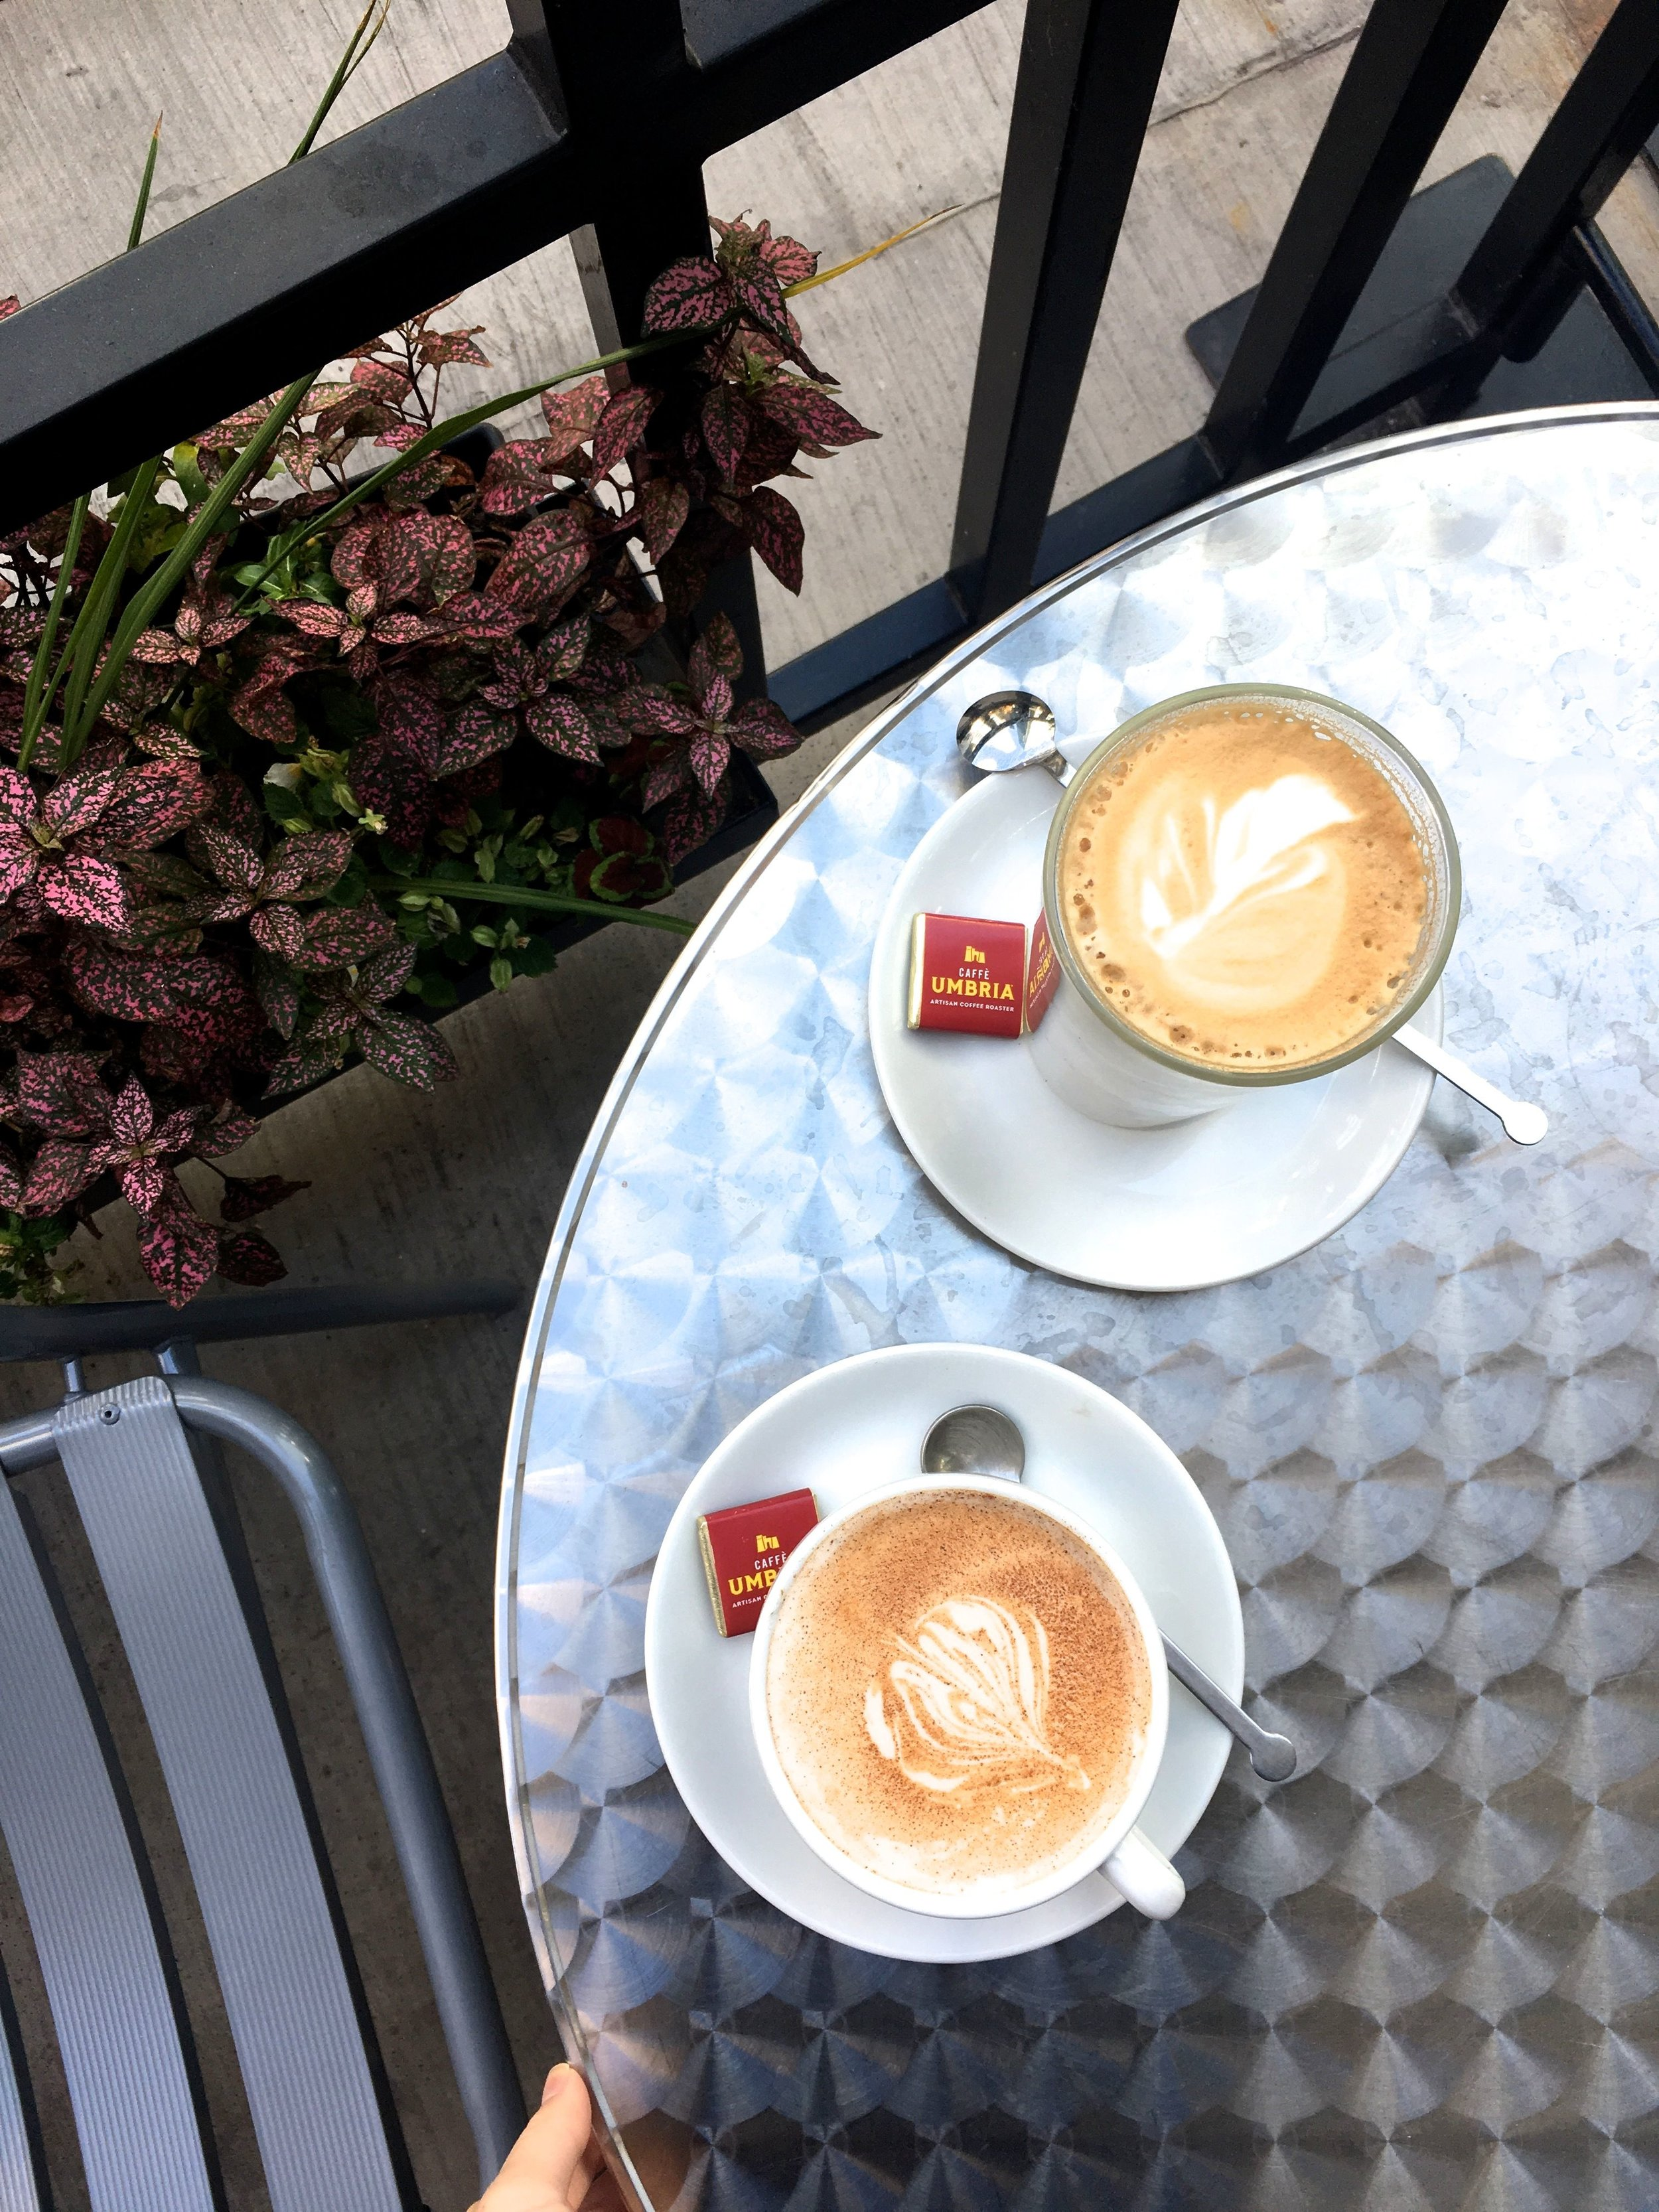 Umbria Coffees.jpg